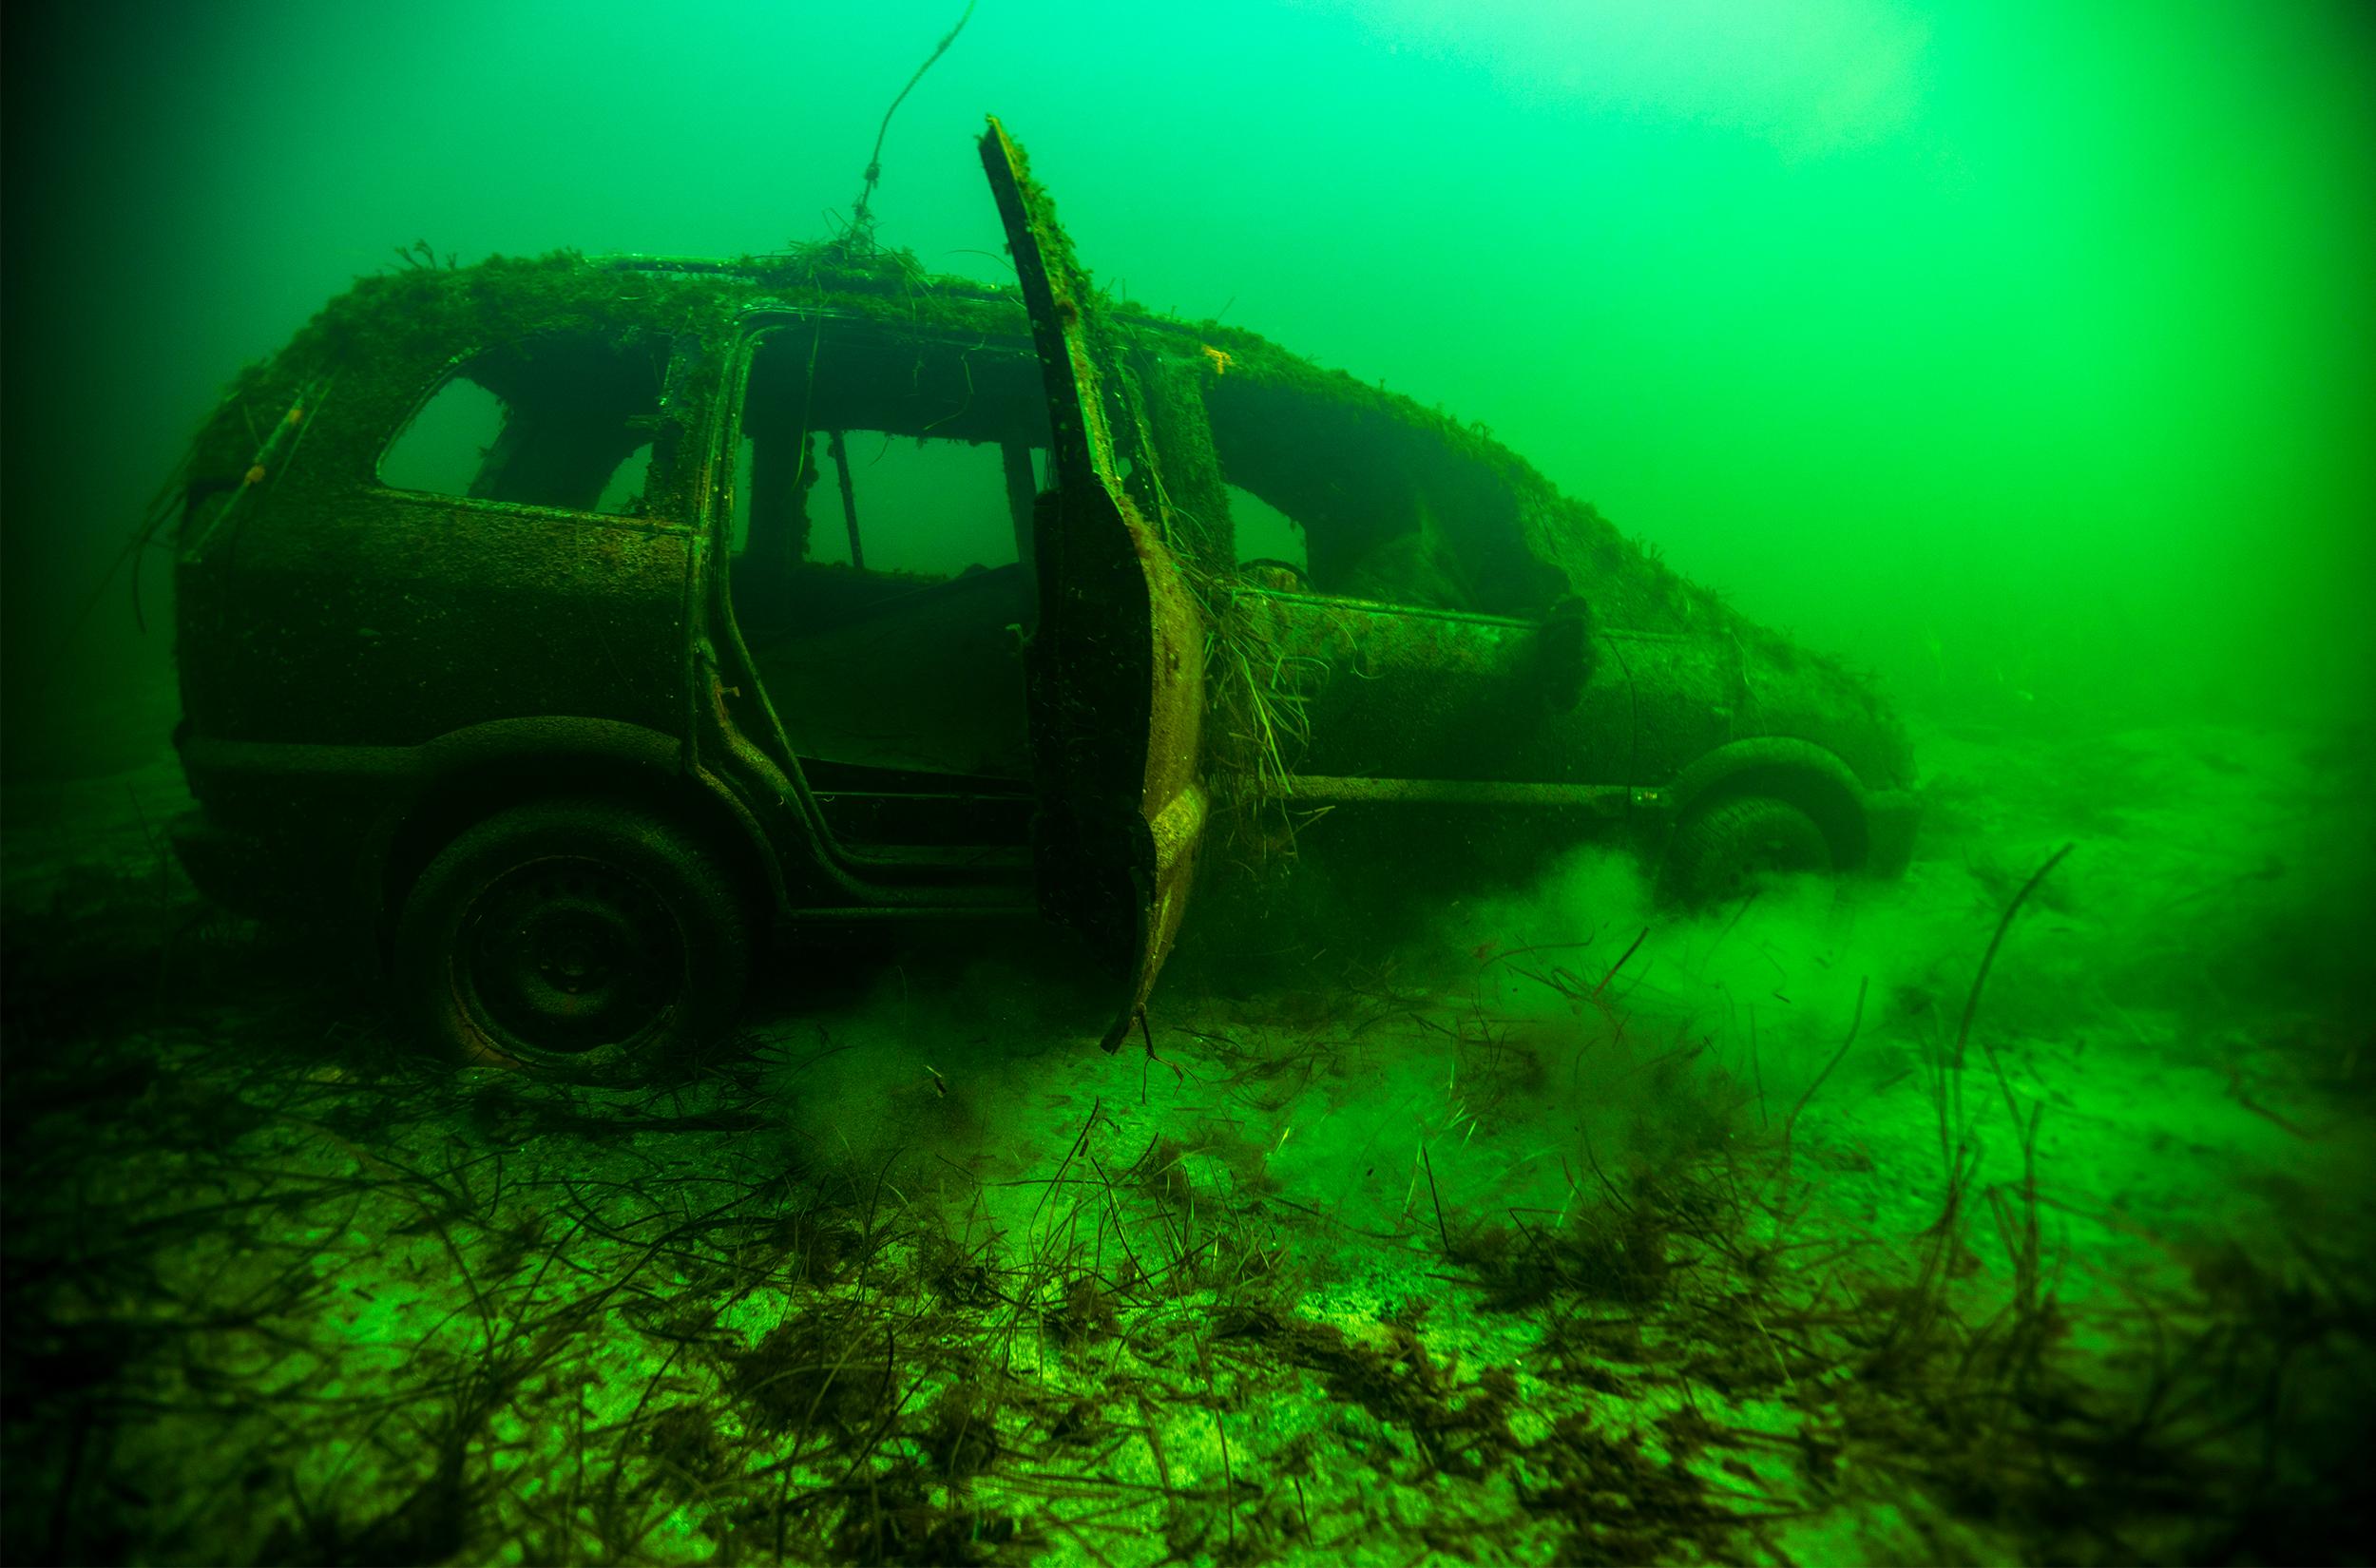 Bil i havnen / Foto: Søren Bech